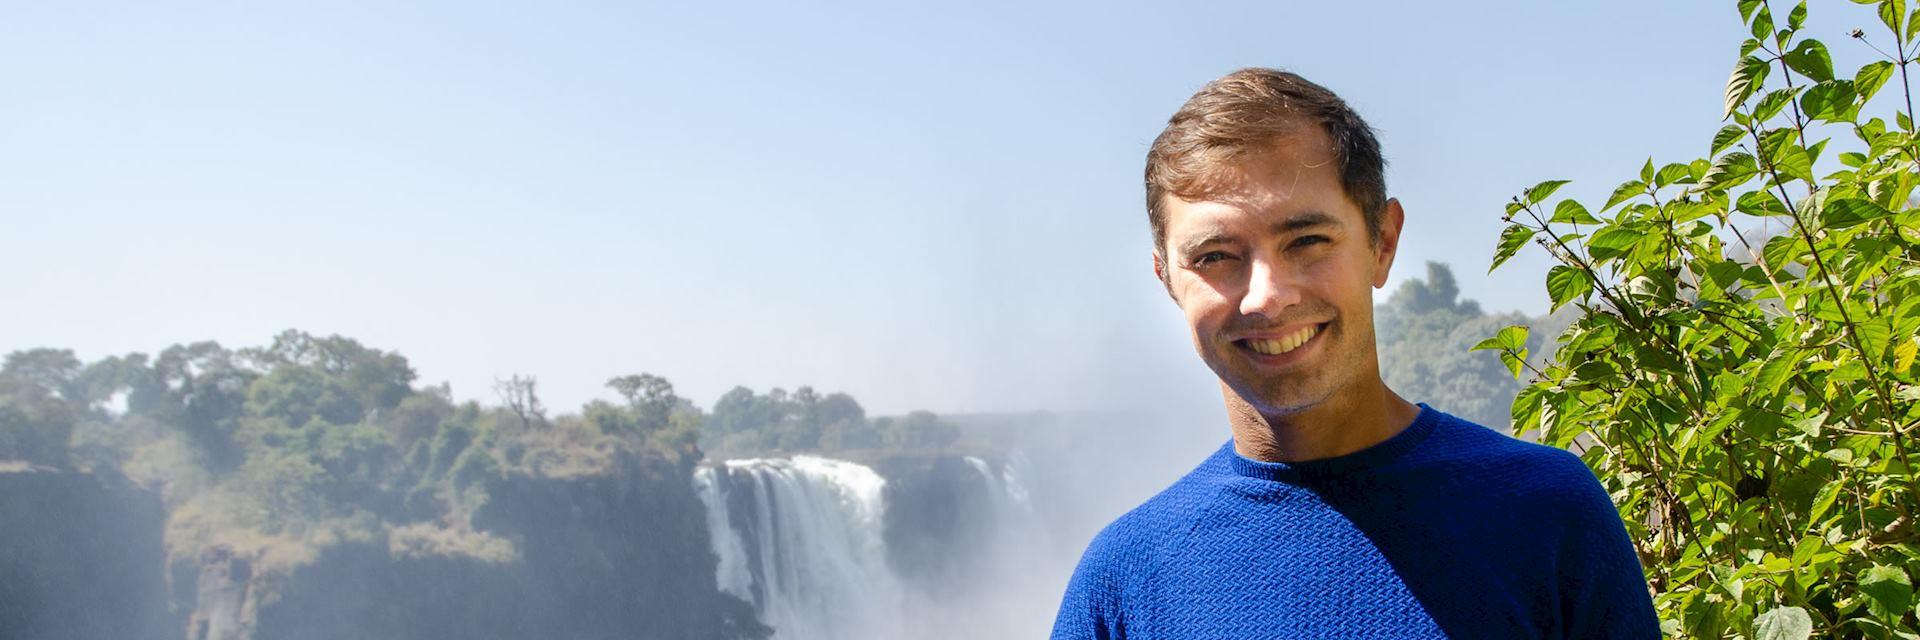 Philip at Victoria Falls, Zimbabwe